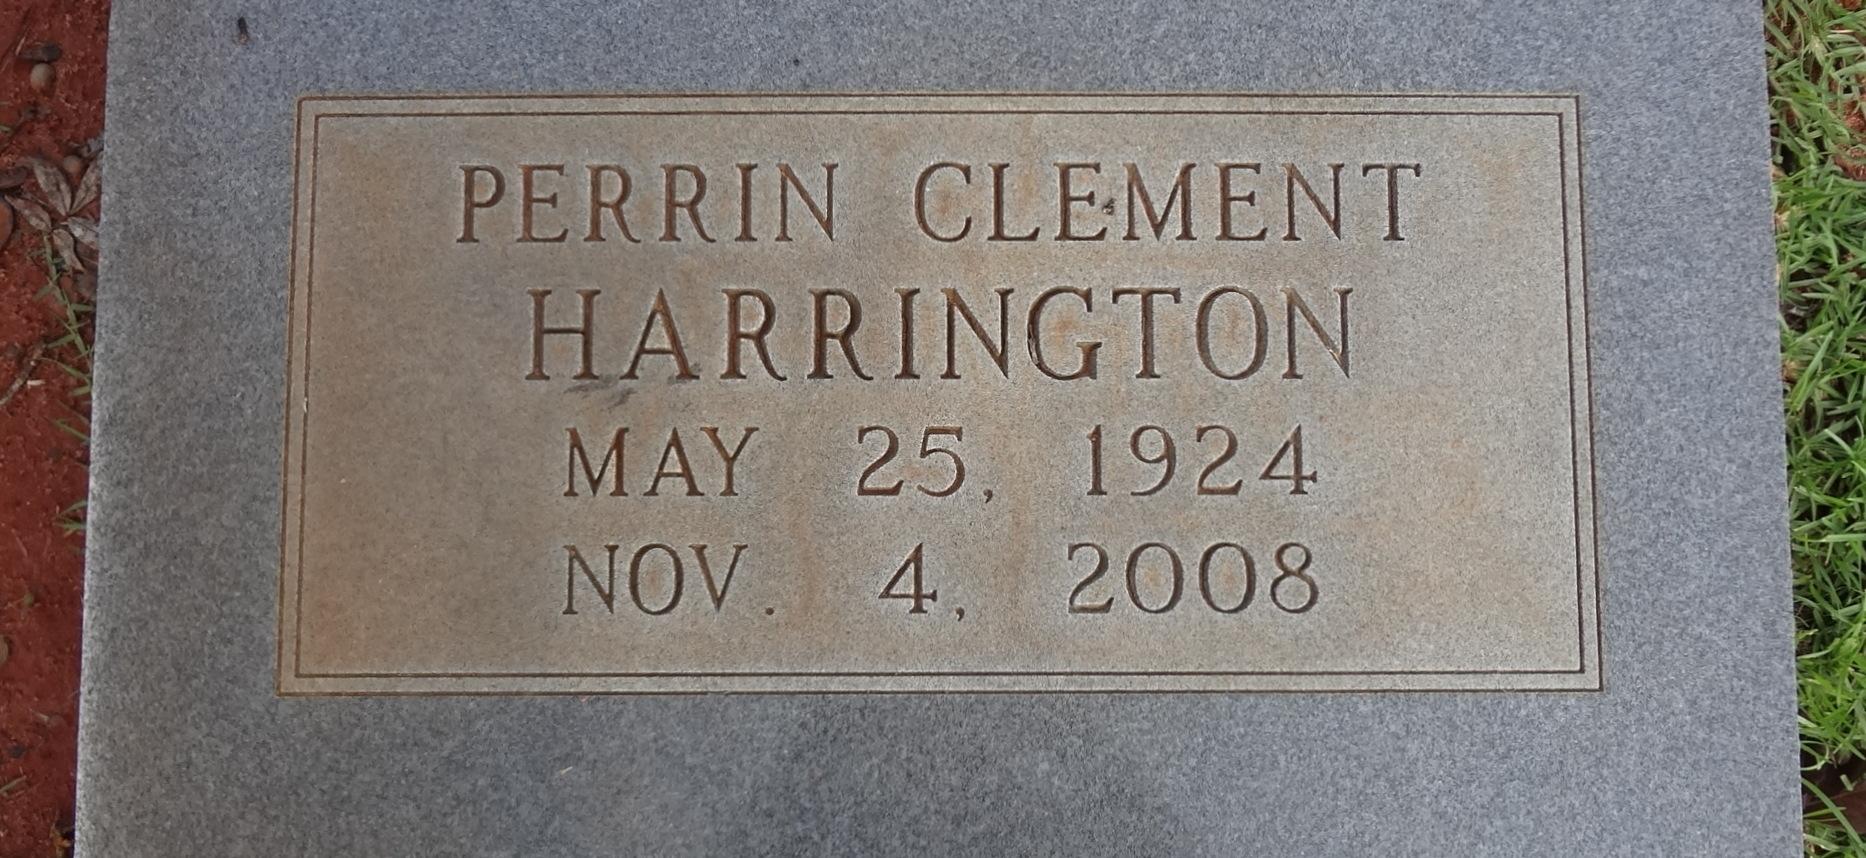 Perrin Clement Harrington